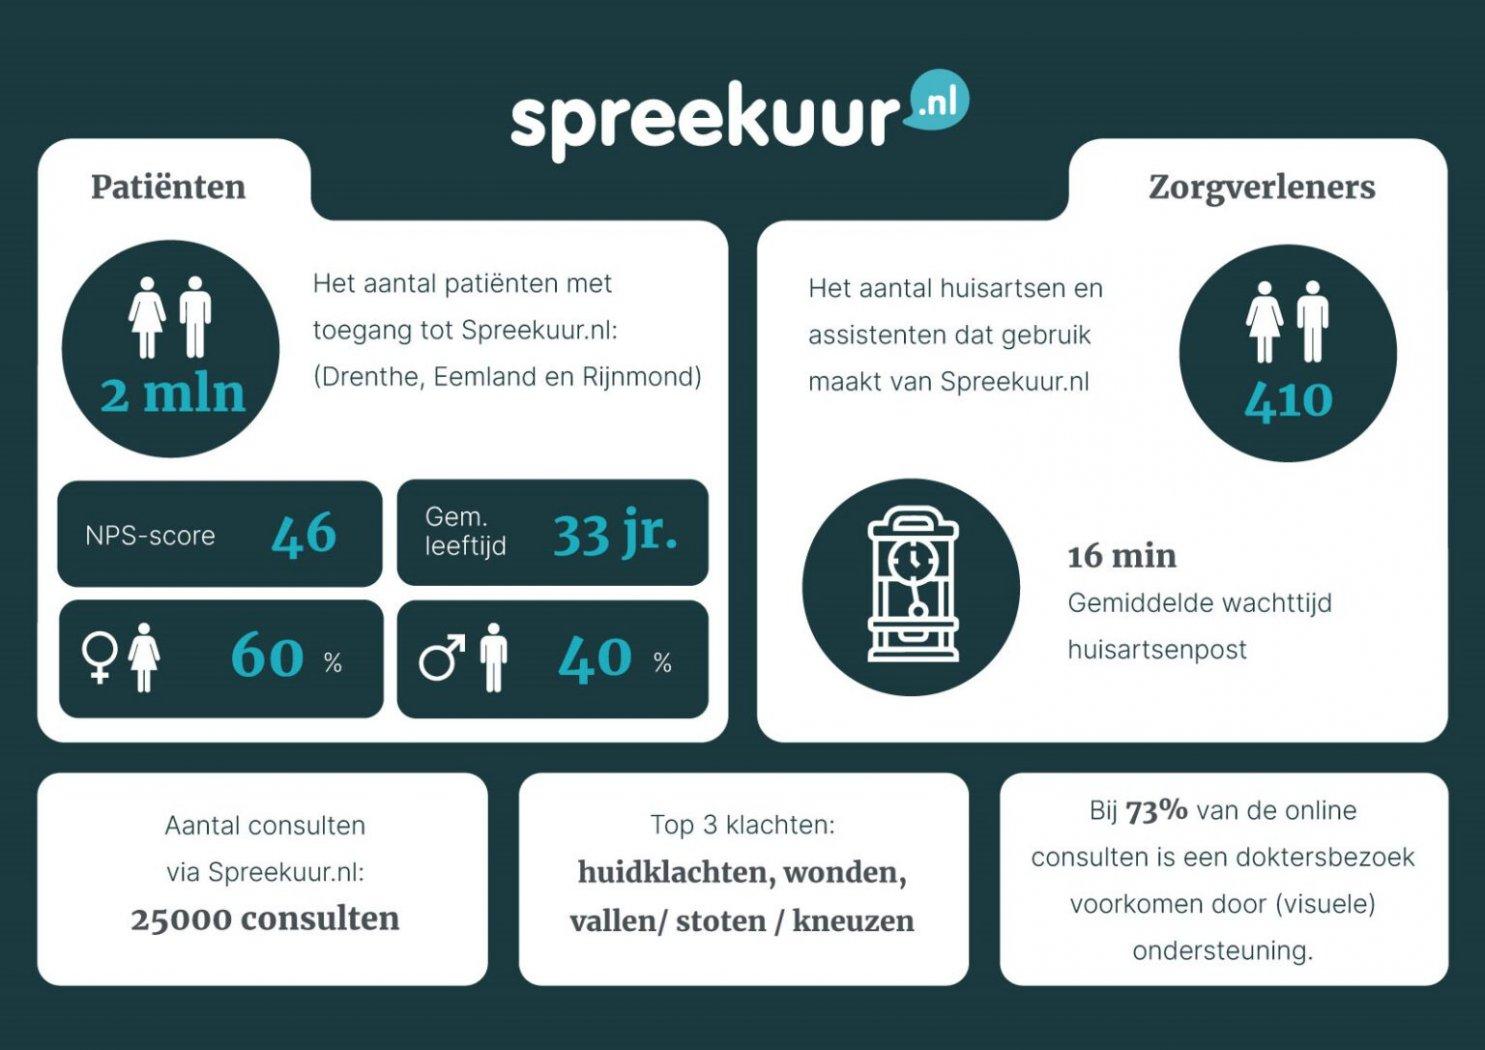 Factsheet Spreekuur.nl